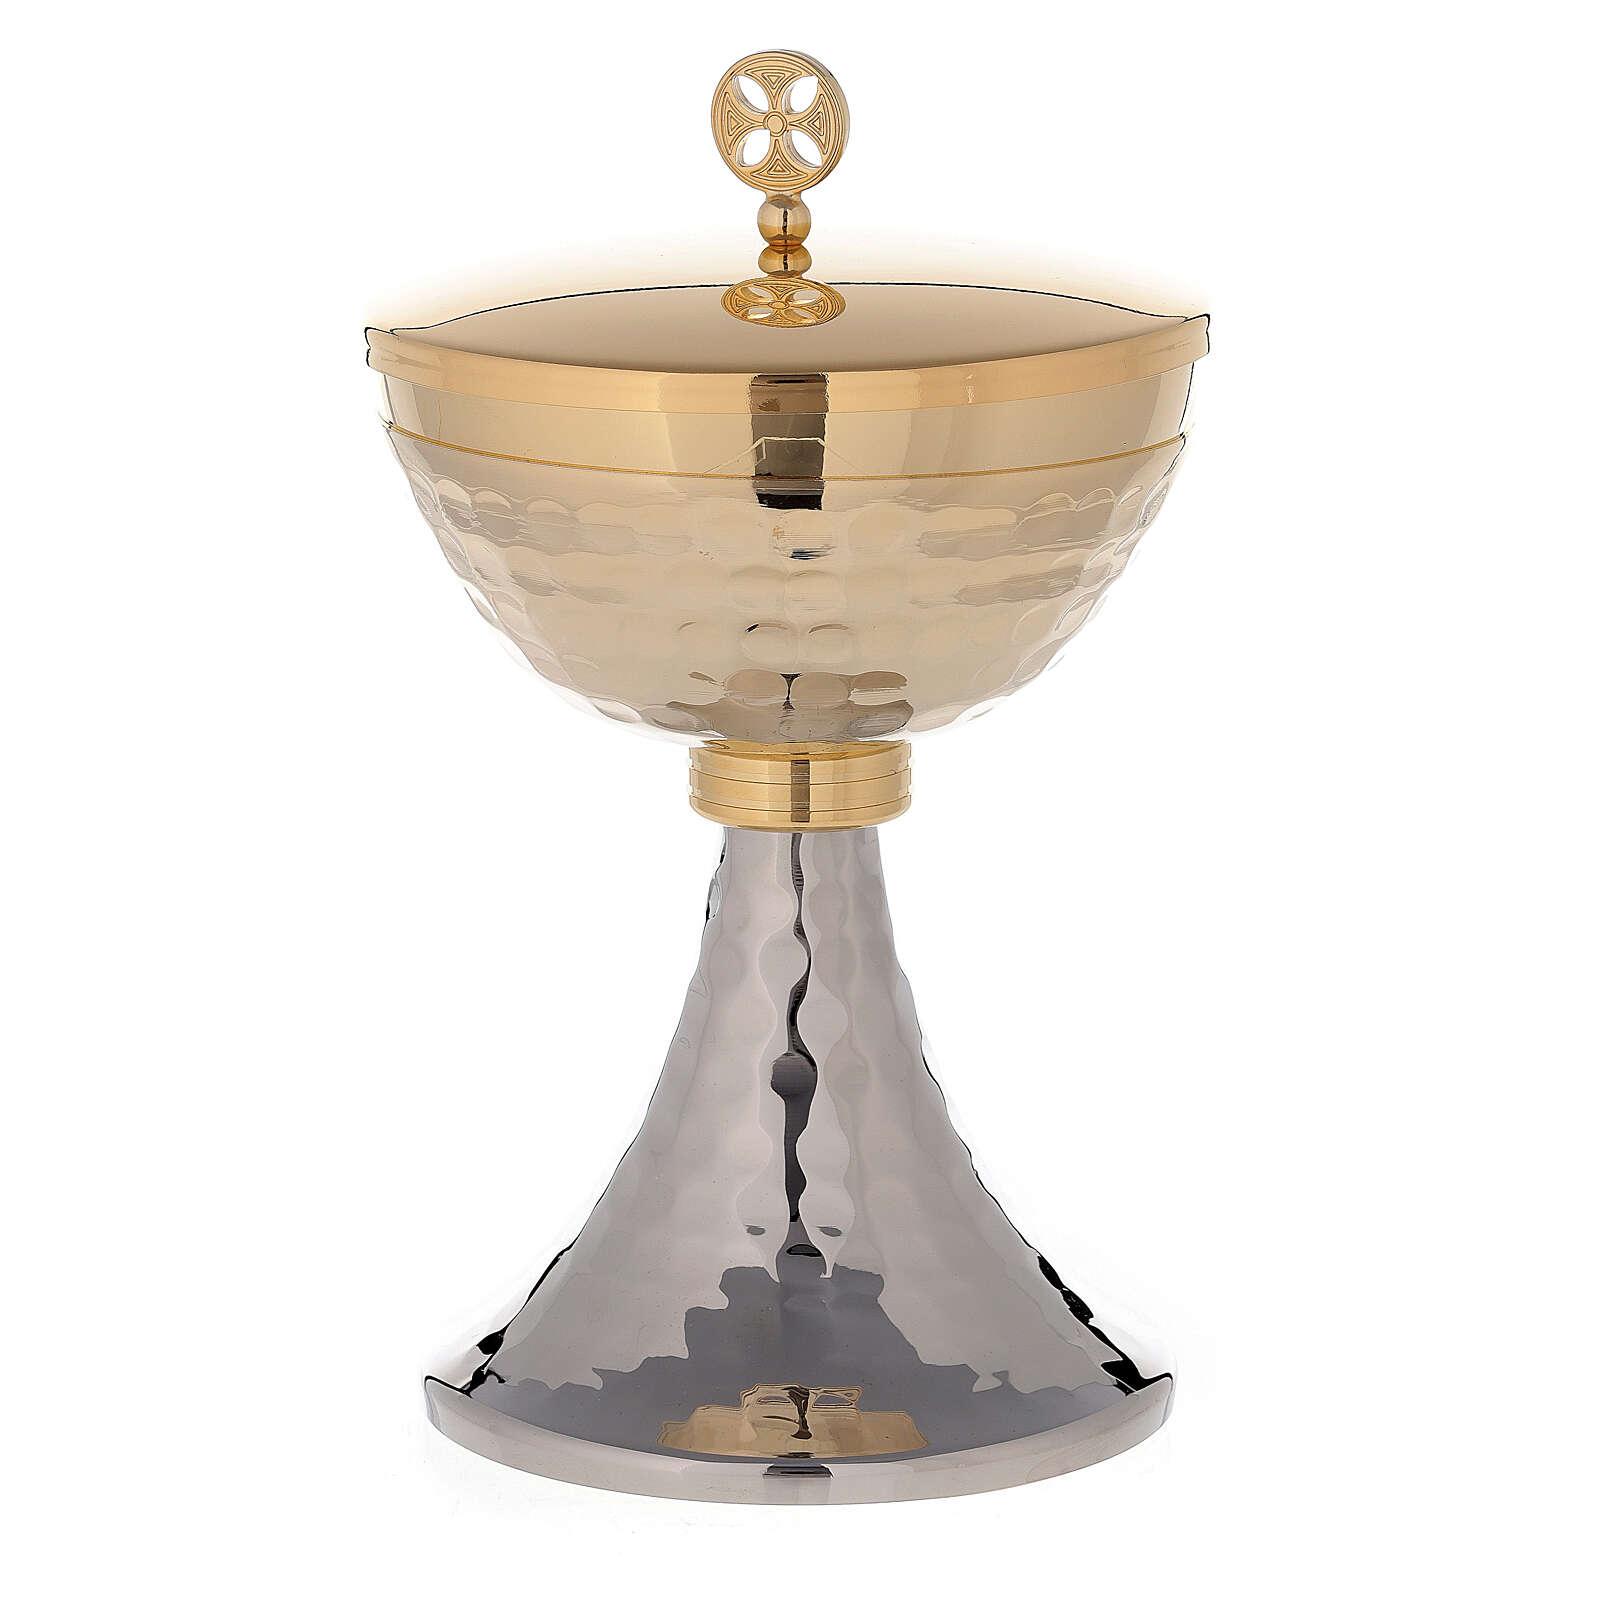 Chalice and Ciborium set in 24K golden brass hammered under-cup simple knop 4